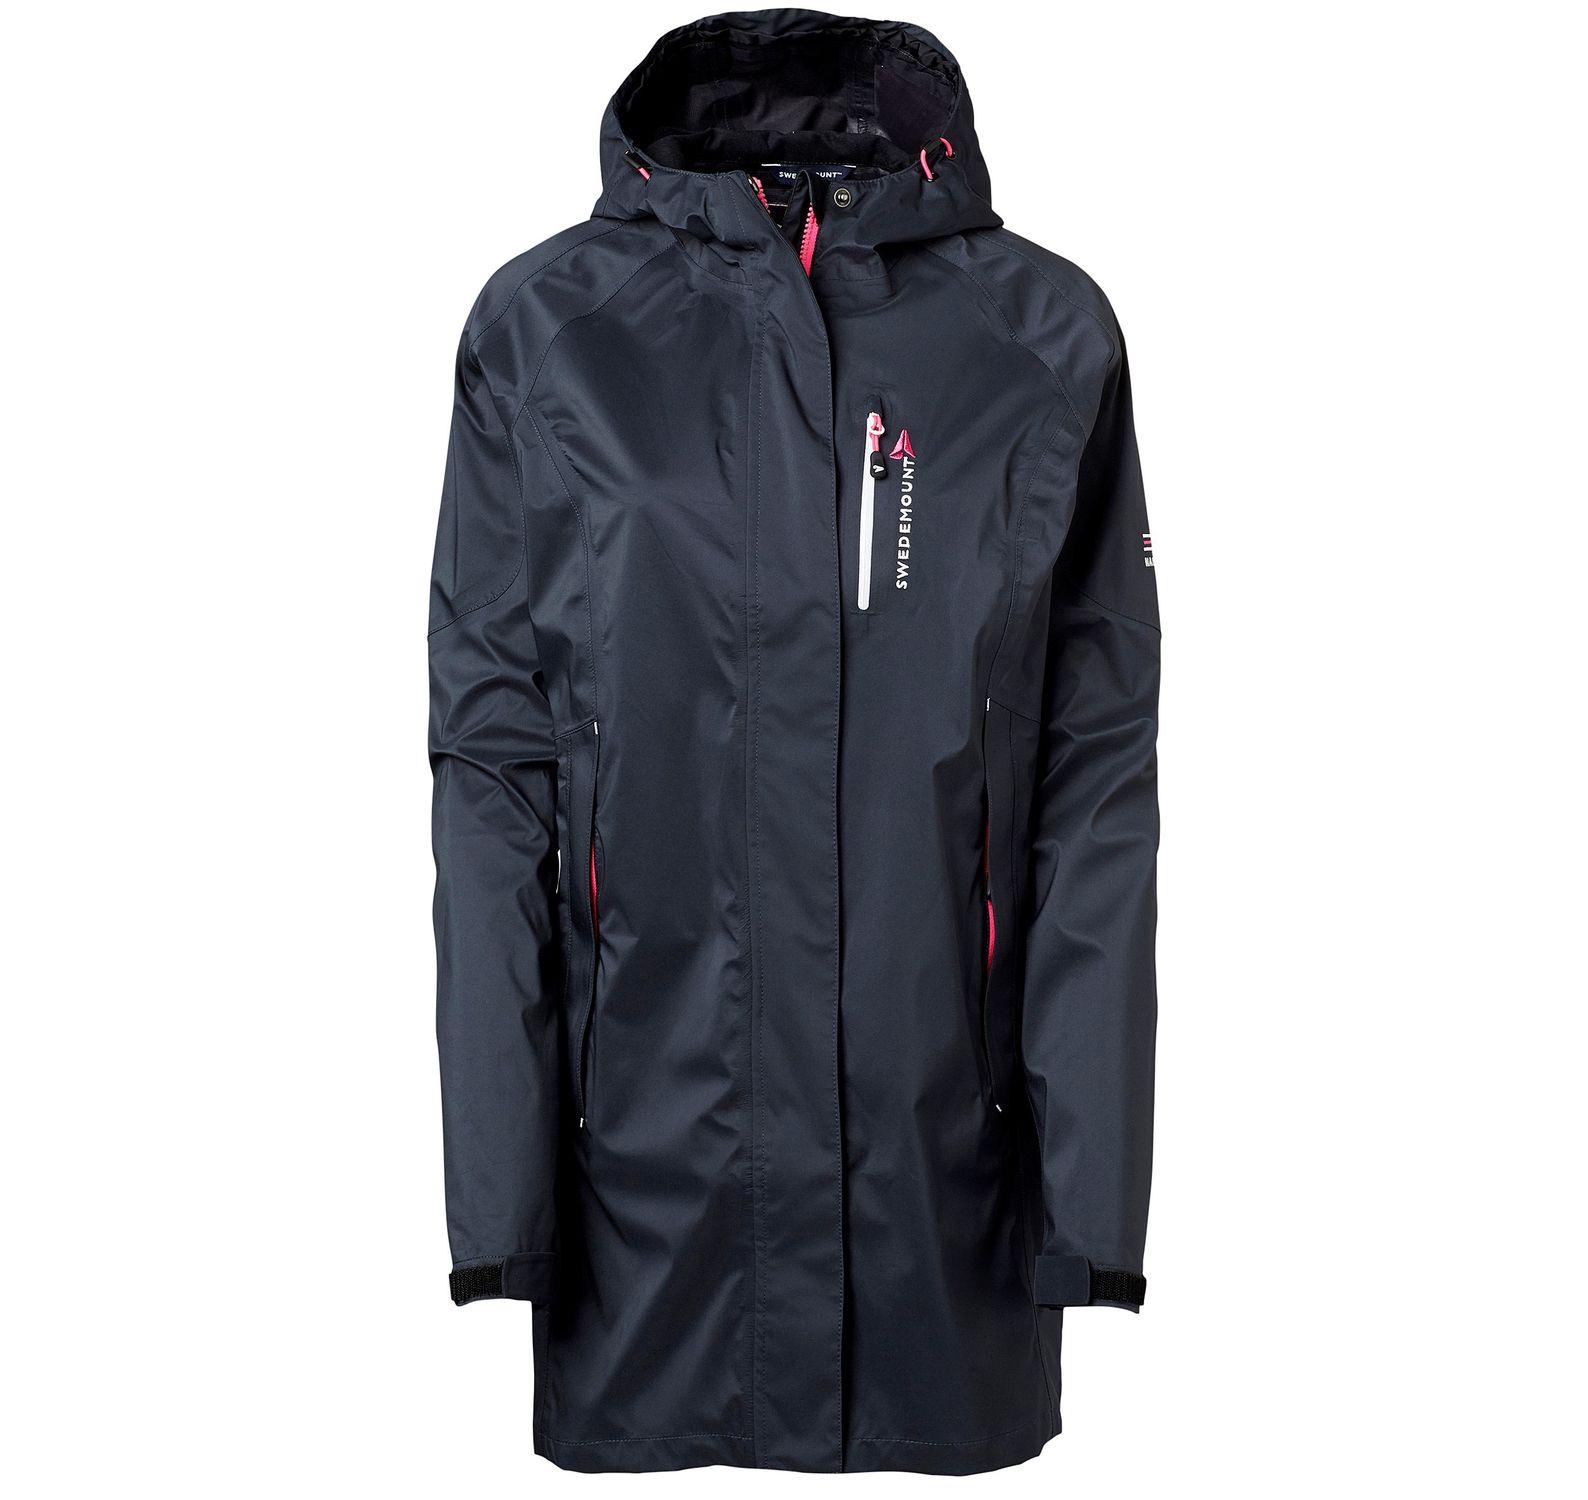 Fiskebäckskil Shell Coat W, Charcoal/Pink, 34, Regnkläder